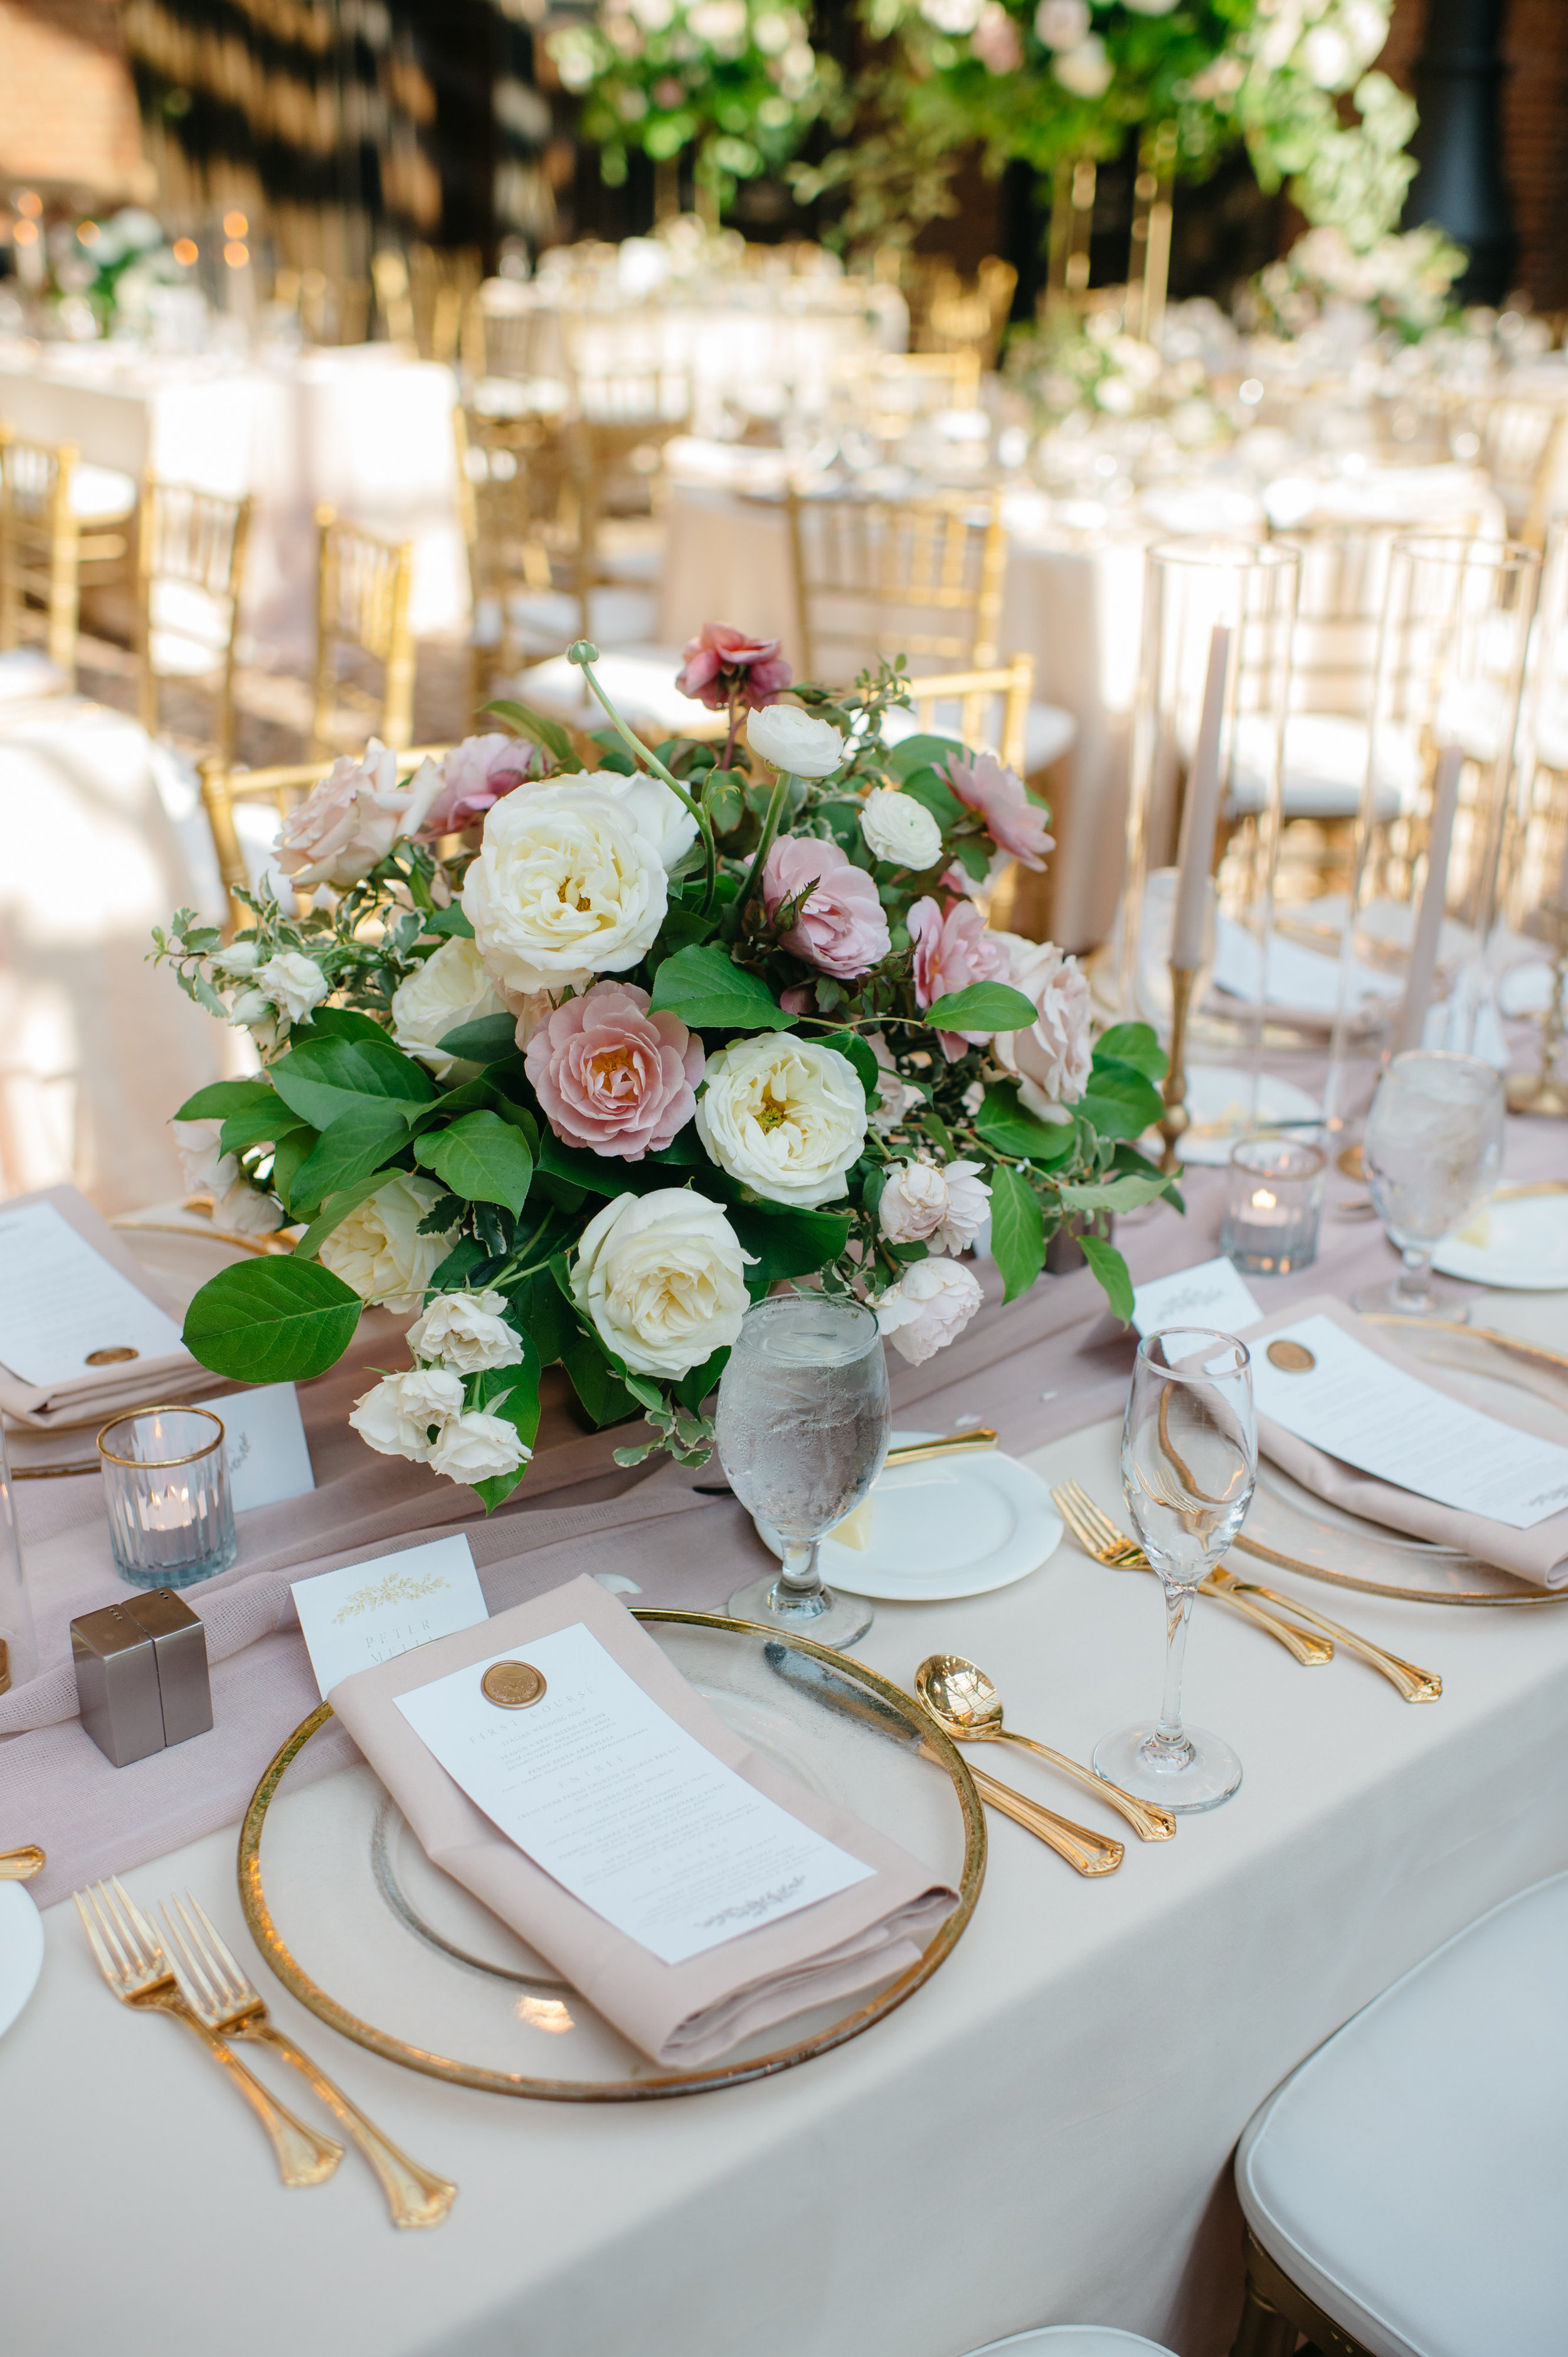 custom wedding planners michigan event design paper goods florals table settings menus centerpieces